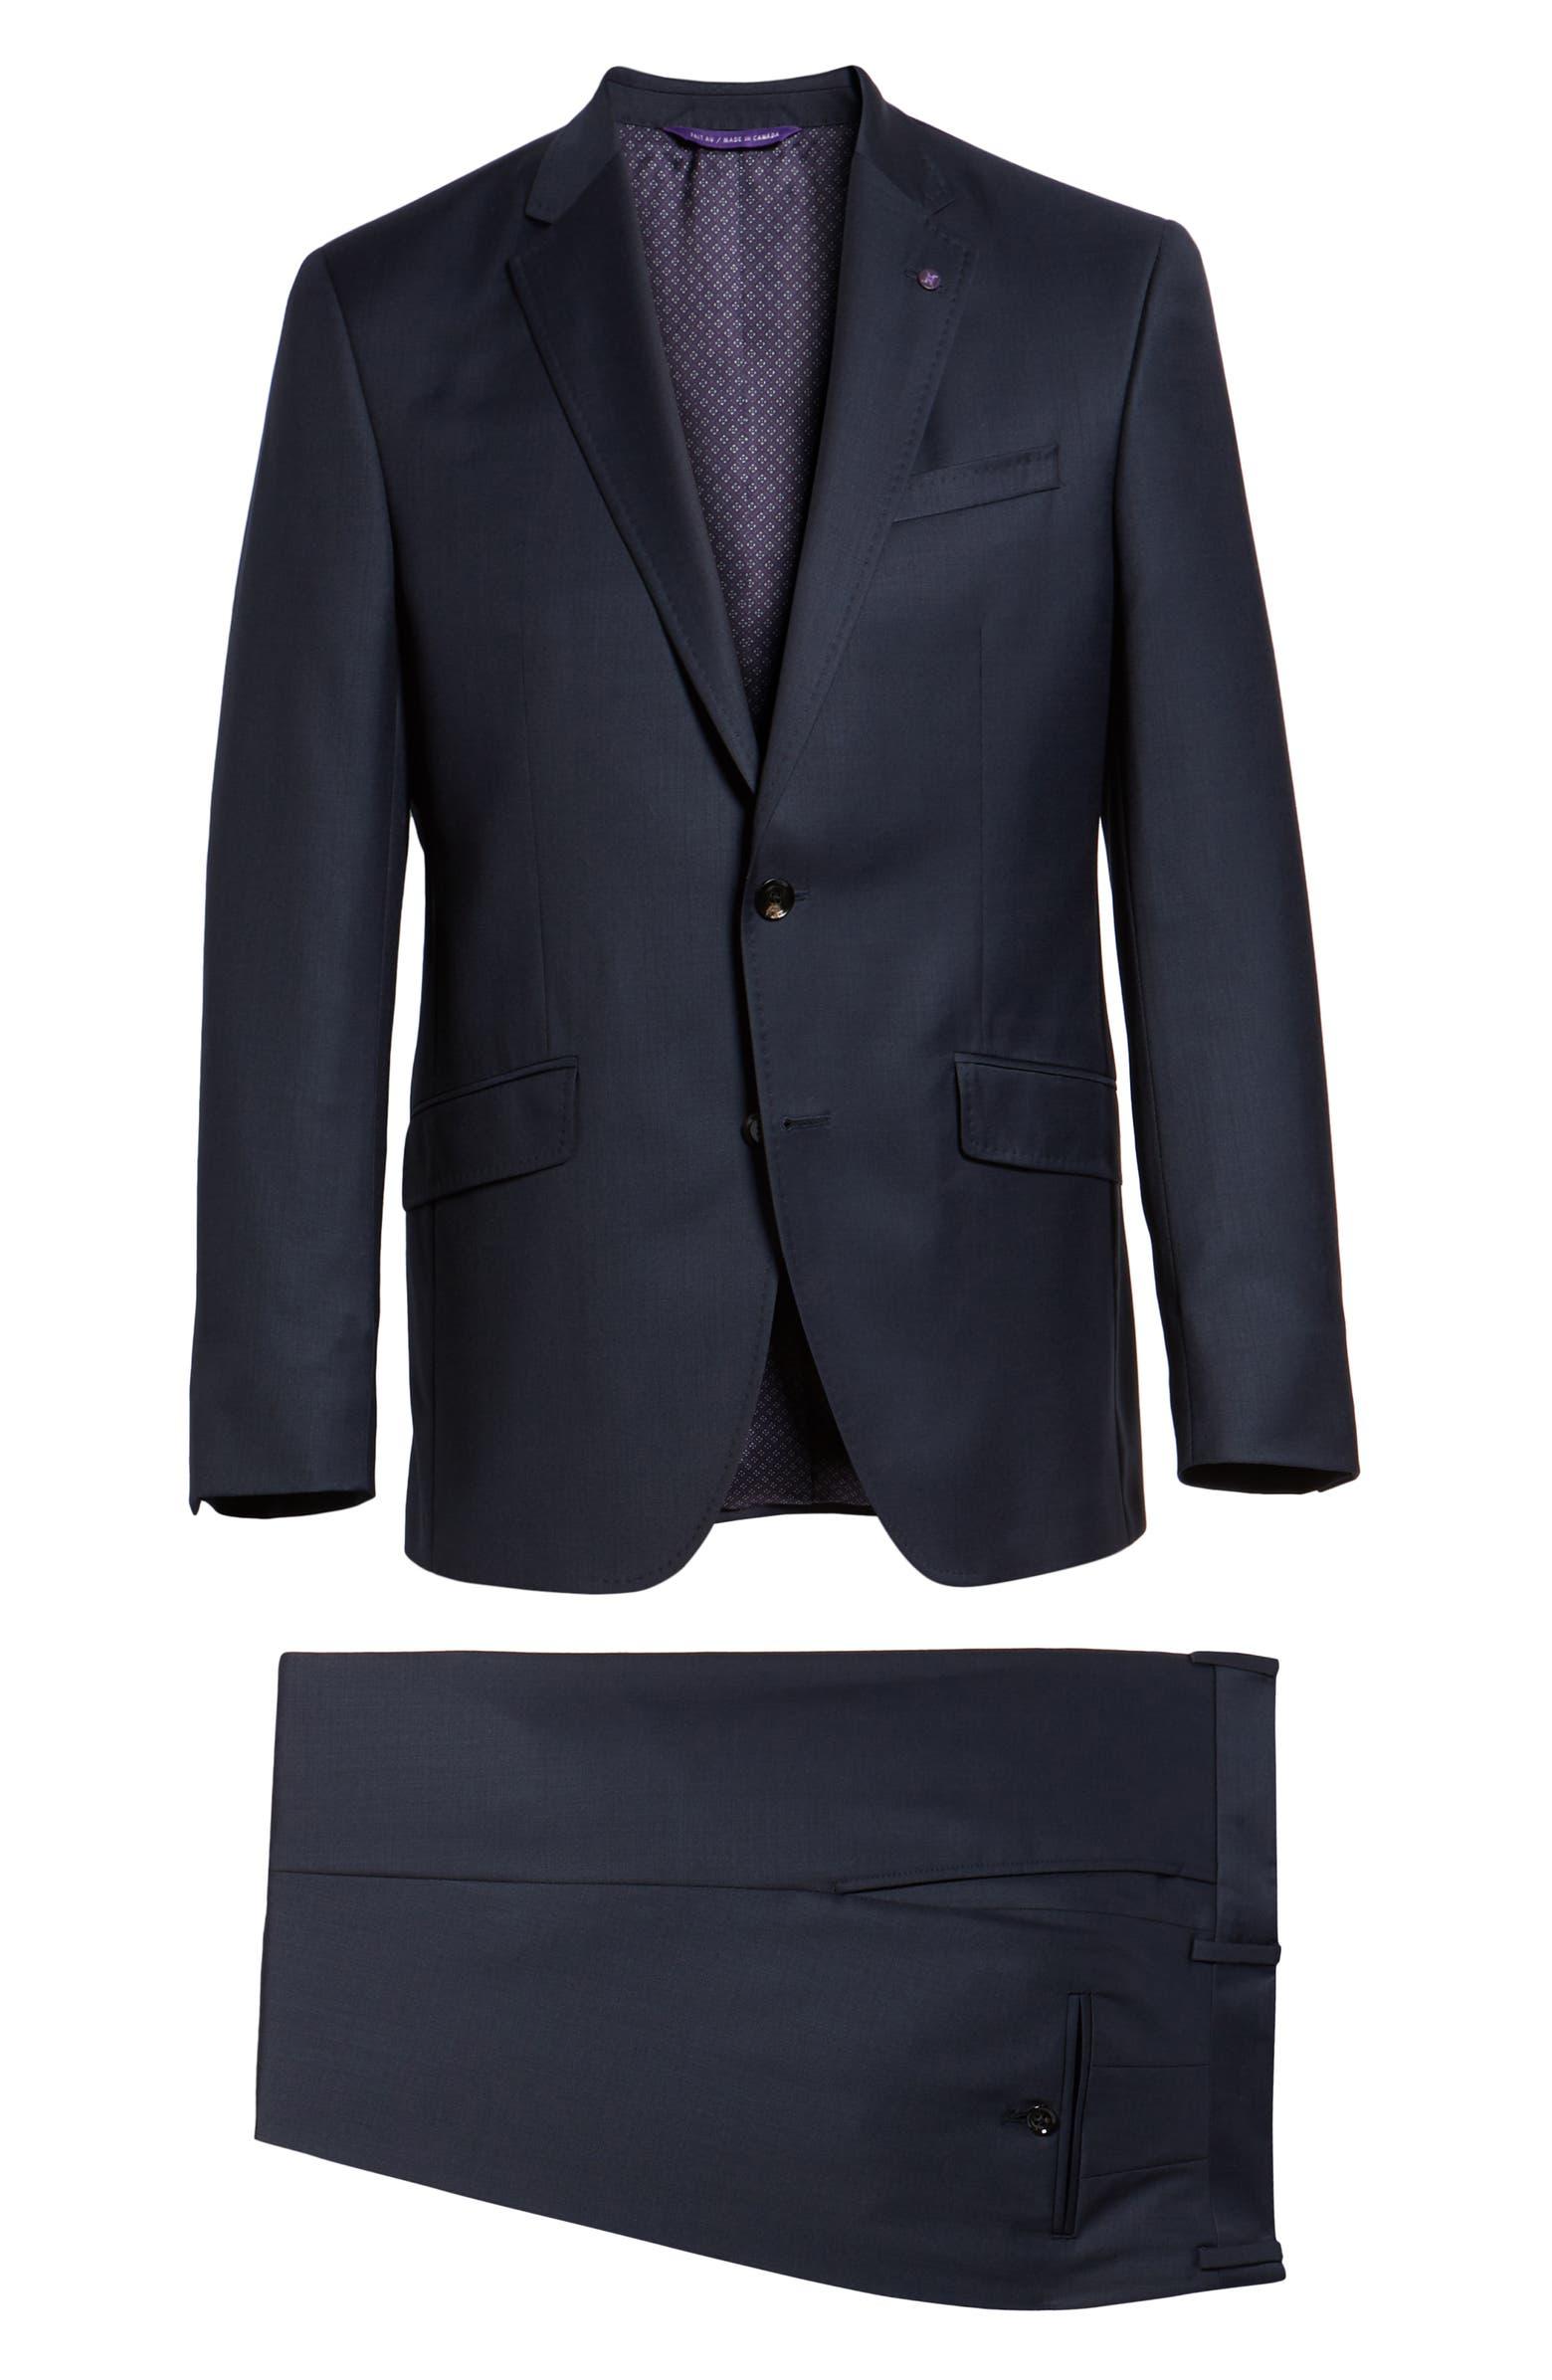 Jones Trim Fit Solid Wool Suit TED BAKER LONDON